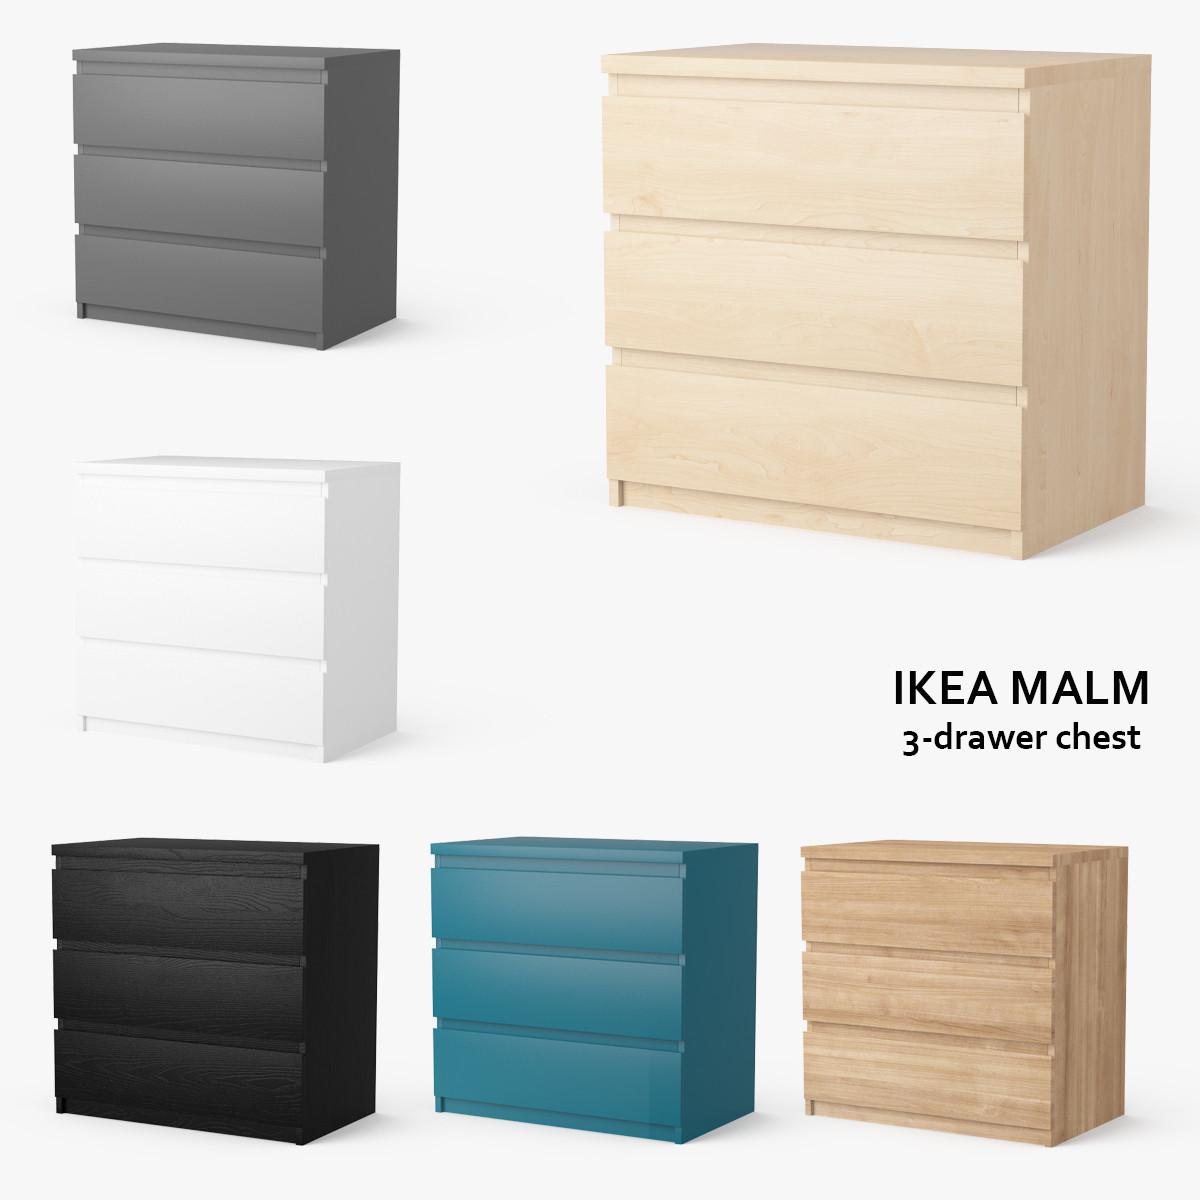 ikea malm 3 drawer chest obj. Black Bedroom Furniture Sets. Home Design Ideas